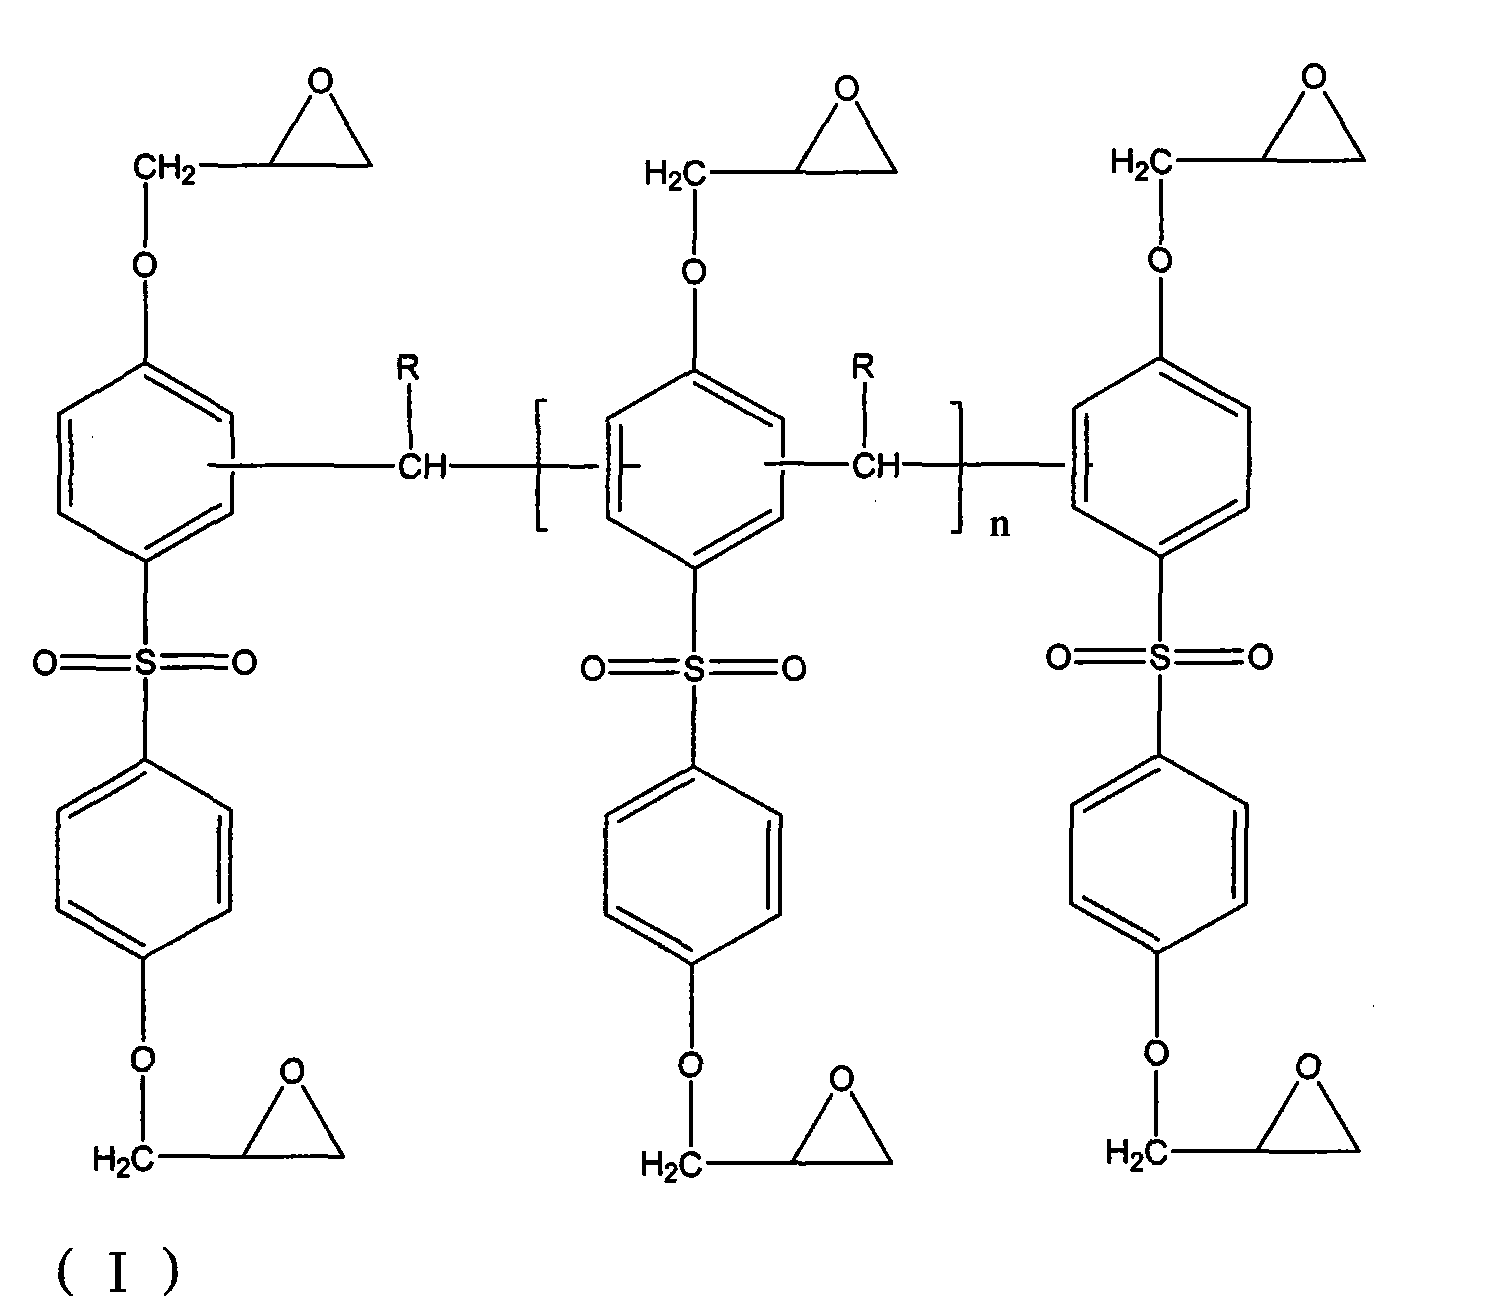 CN102336889A - Bisphenol S novolac epoxy resin and its